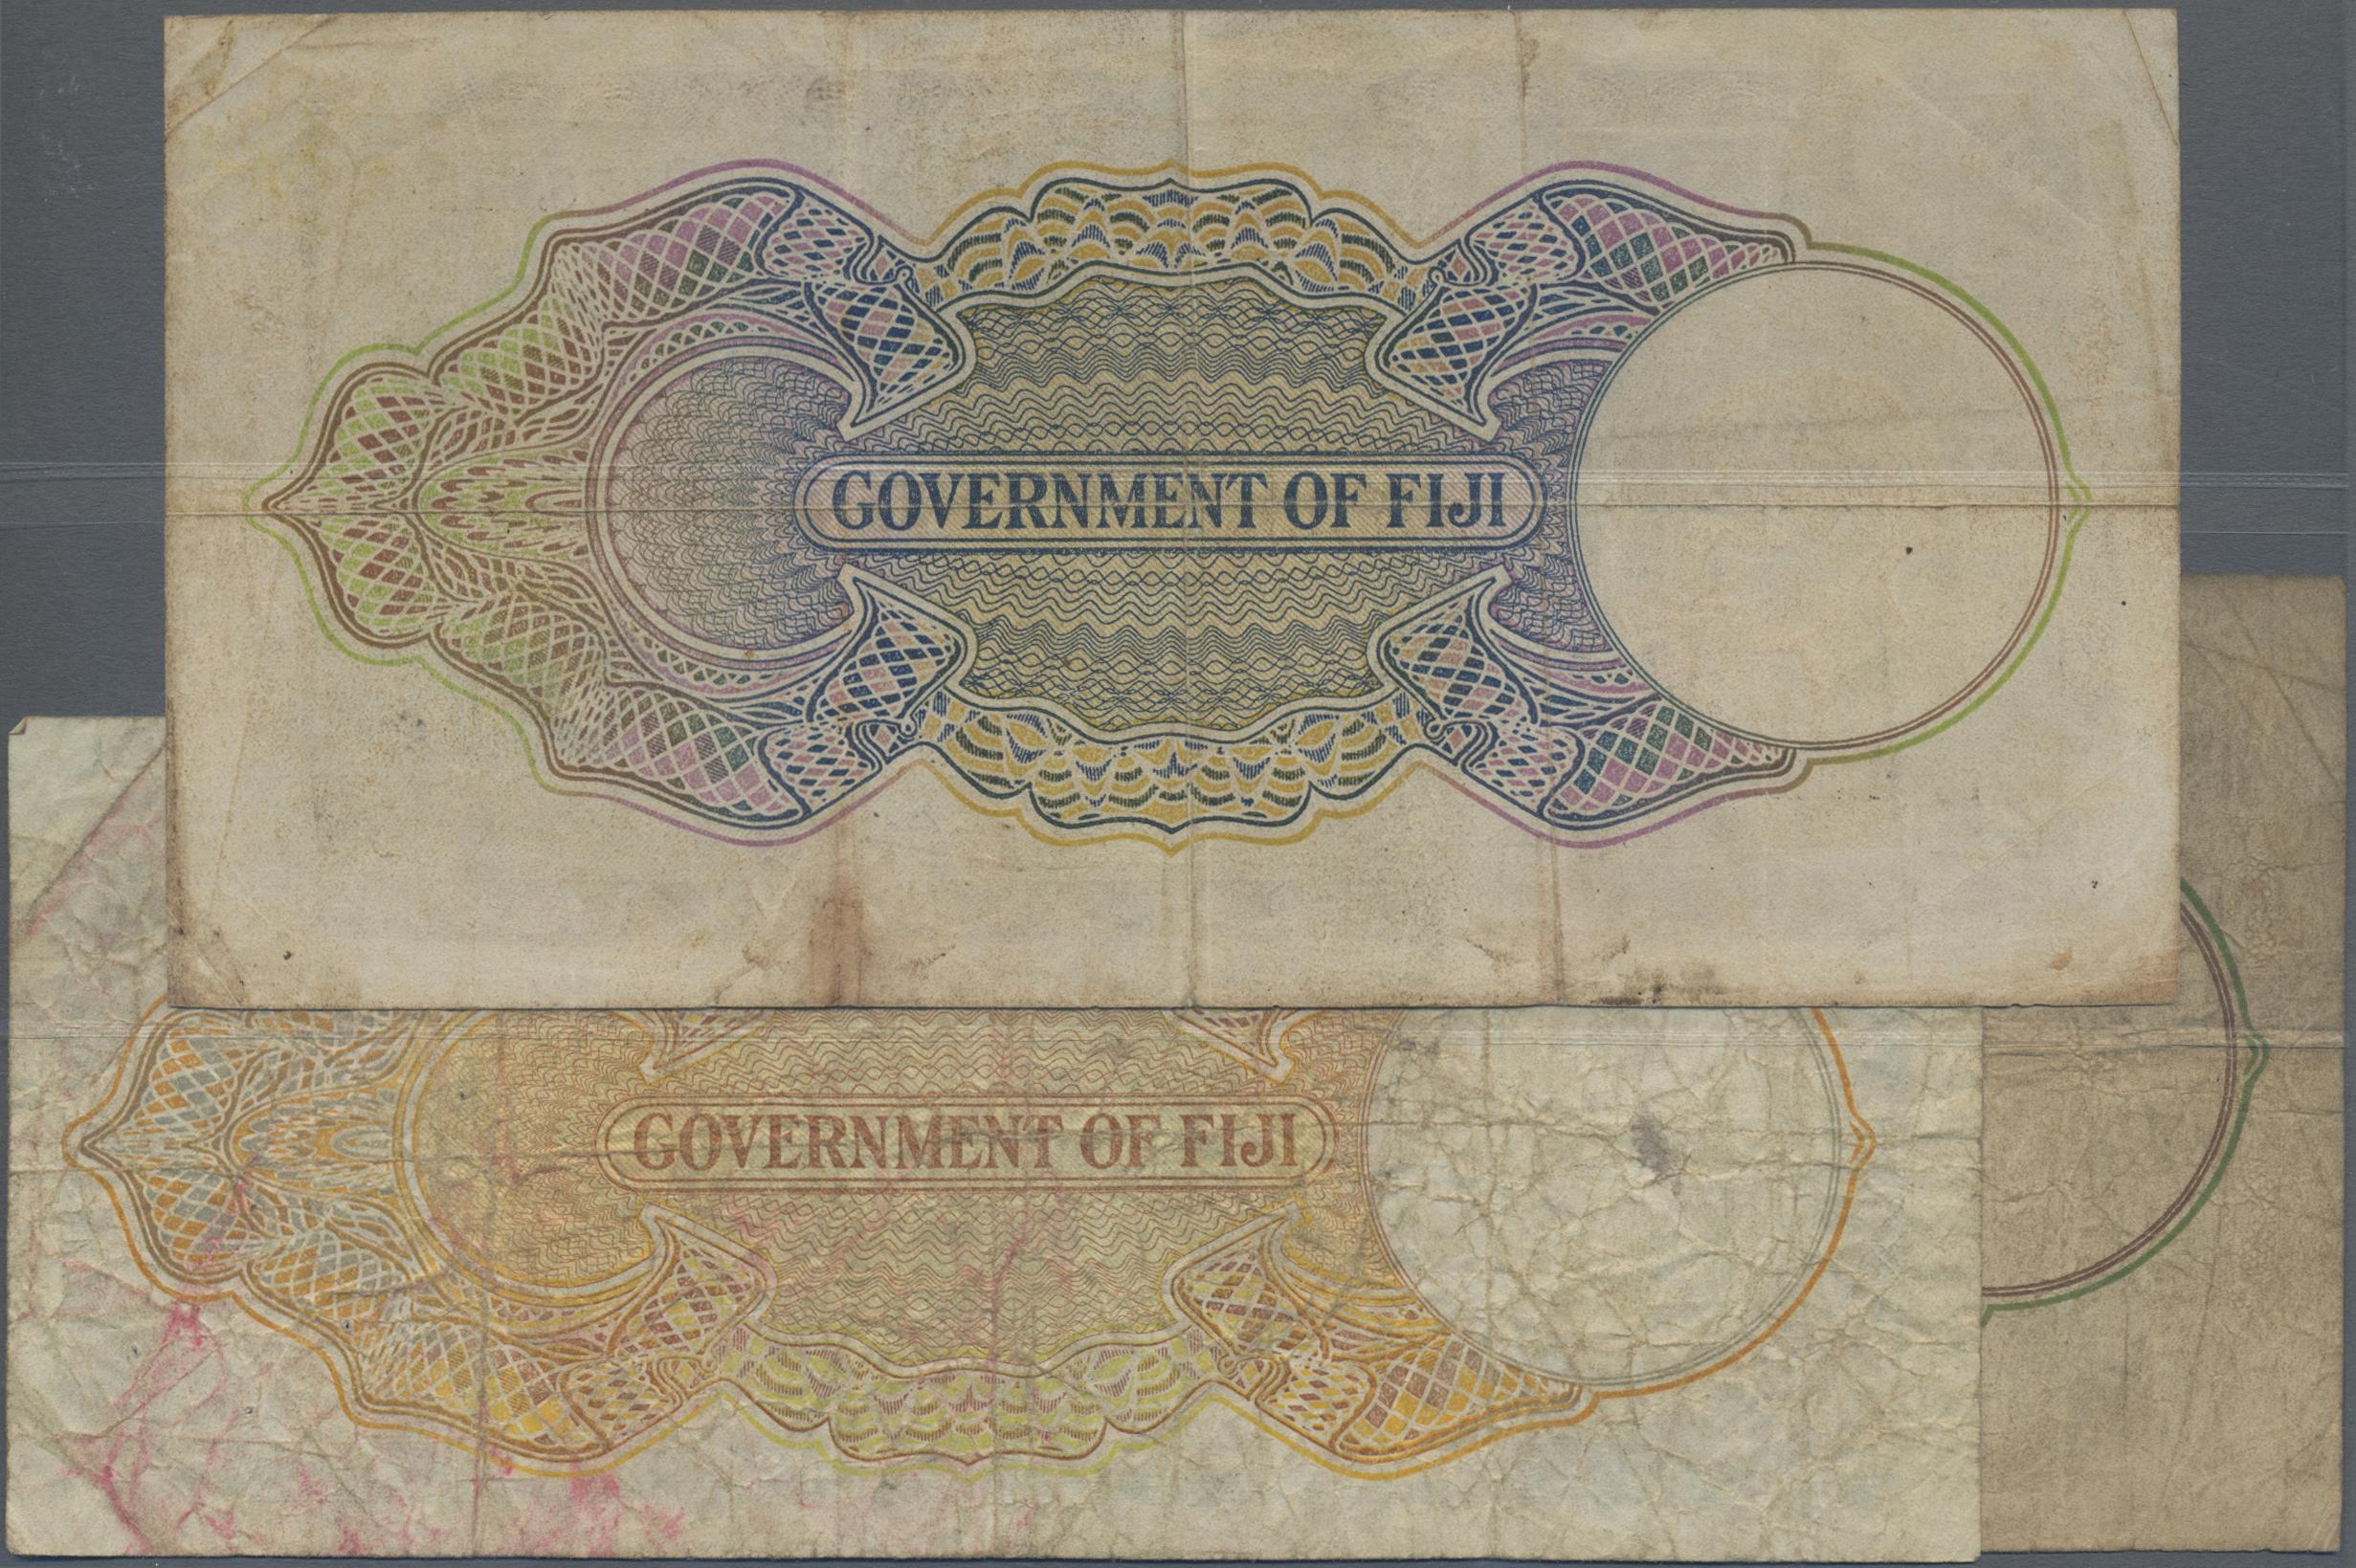 Lot 00241 - Fiji | Banknoten  -  Auktionshaus Christoph Gärtner GmbH & Co. KG Sale #48 The Banknotes